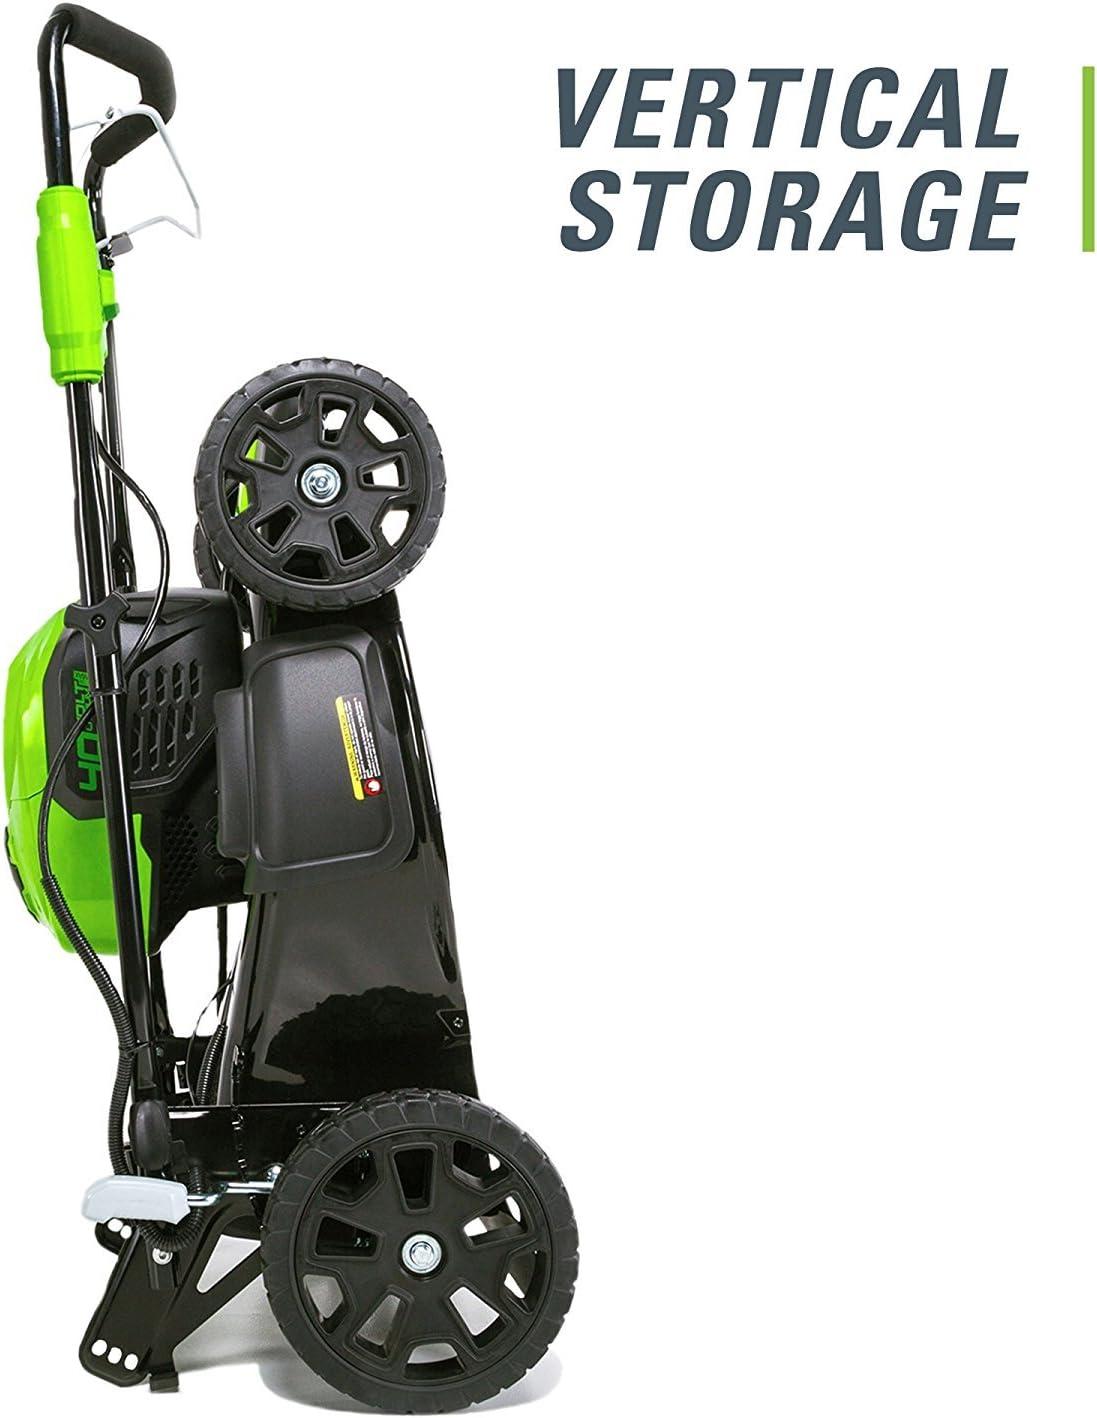 greenworks mower 40v MO40L01 Brushless Cordless Lawn Mower